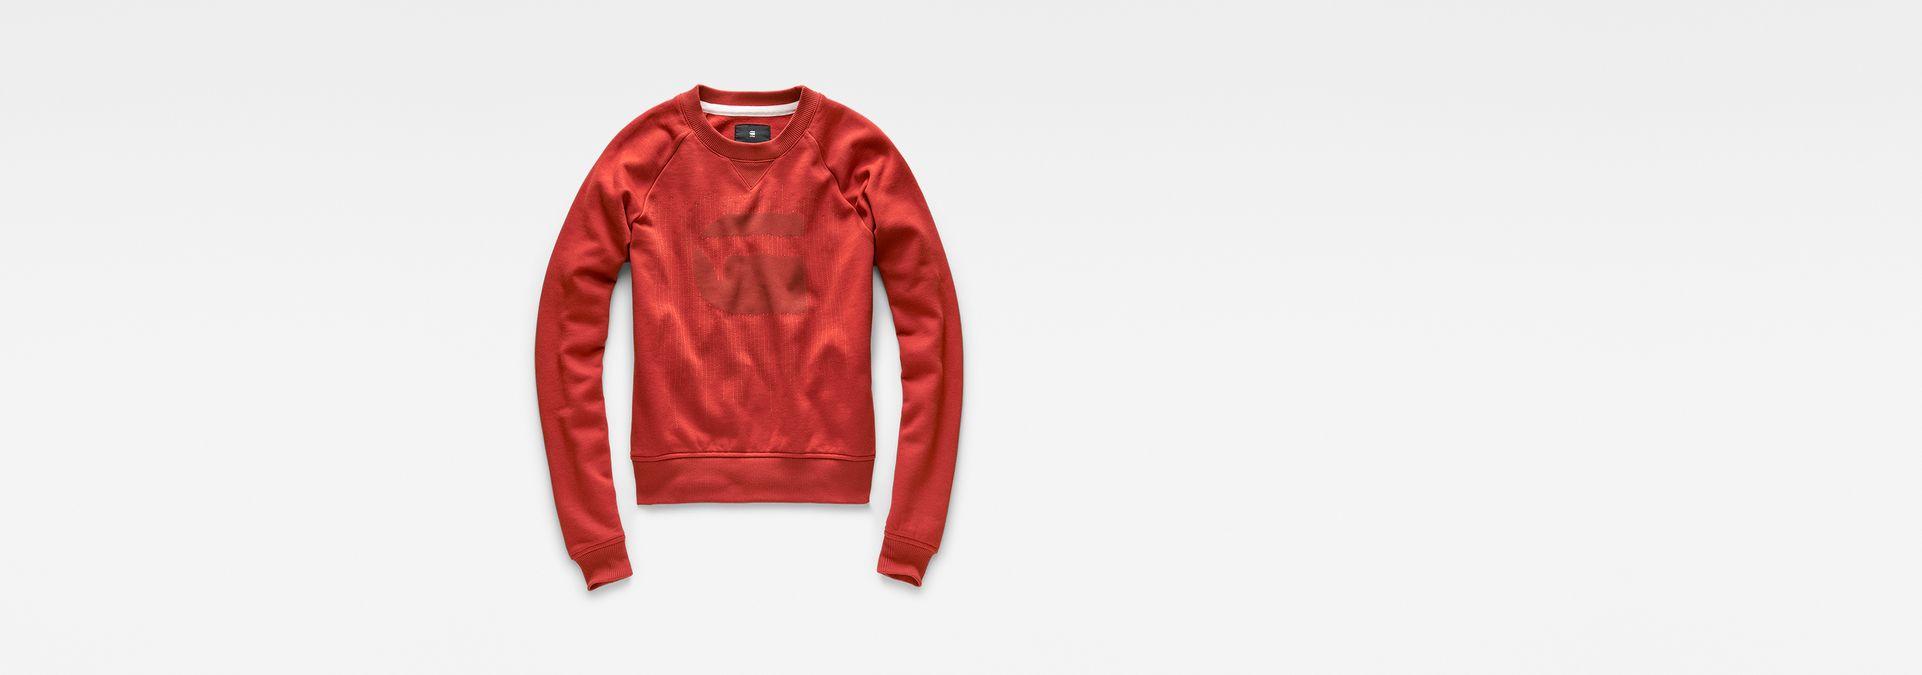 G-Star Raw Womens Xula Cropped Sweatshirt Antic Red